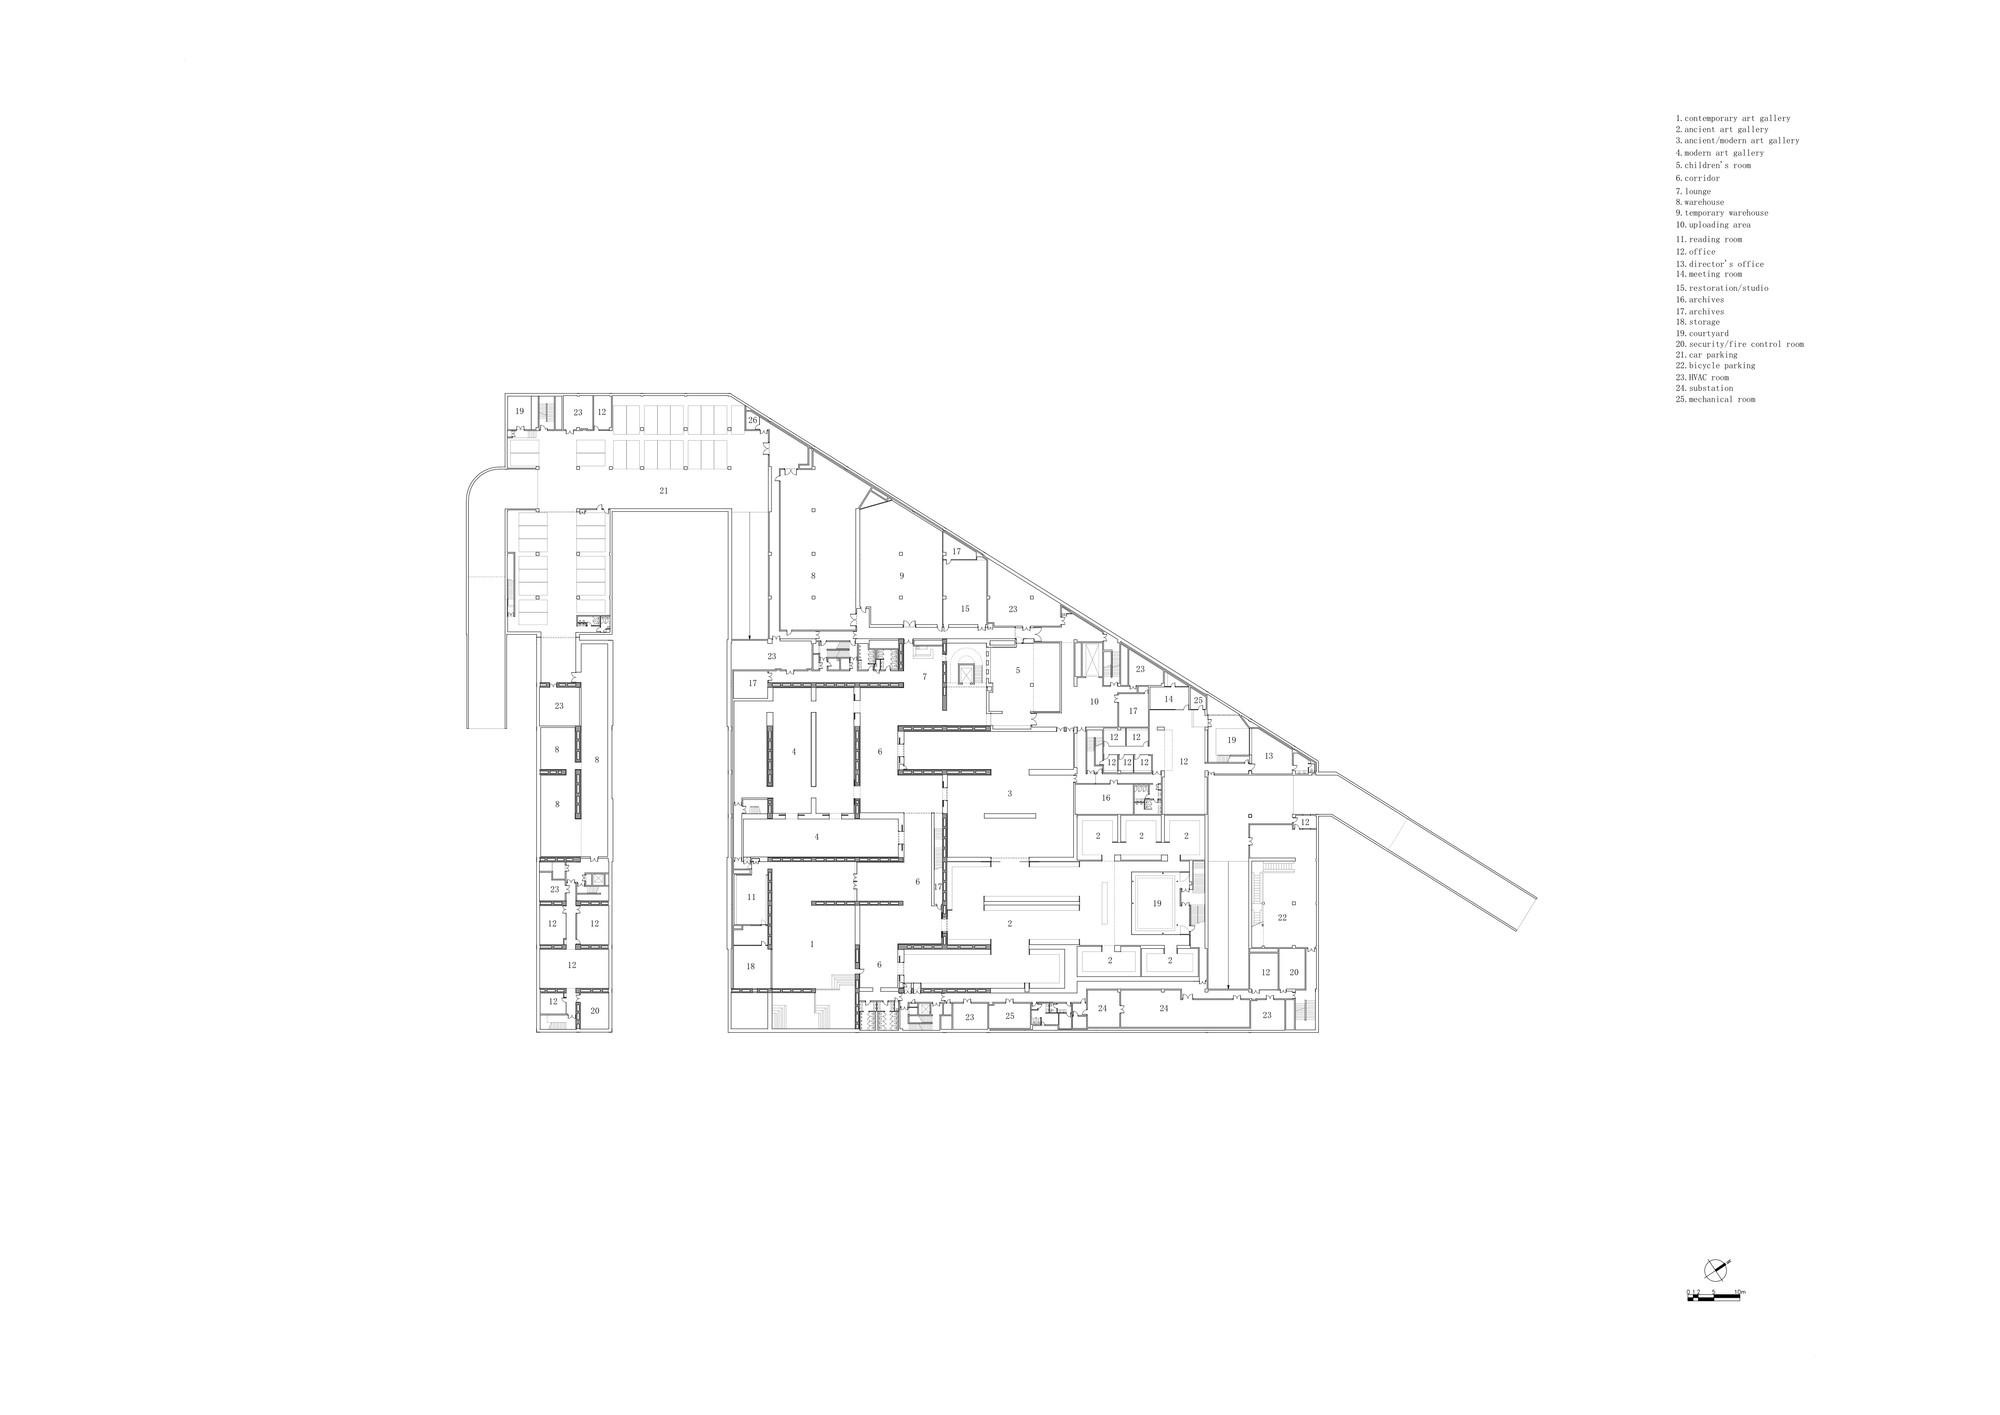 Gallery Of Long Museum West Bund Atelier Deshaus 31